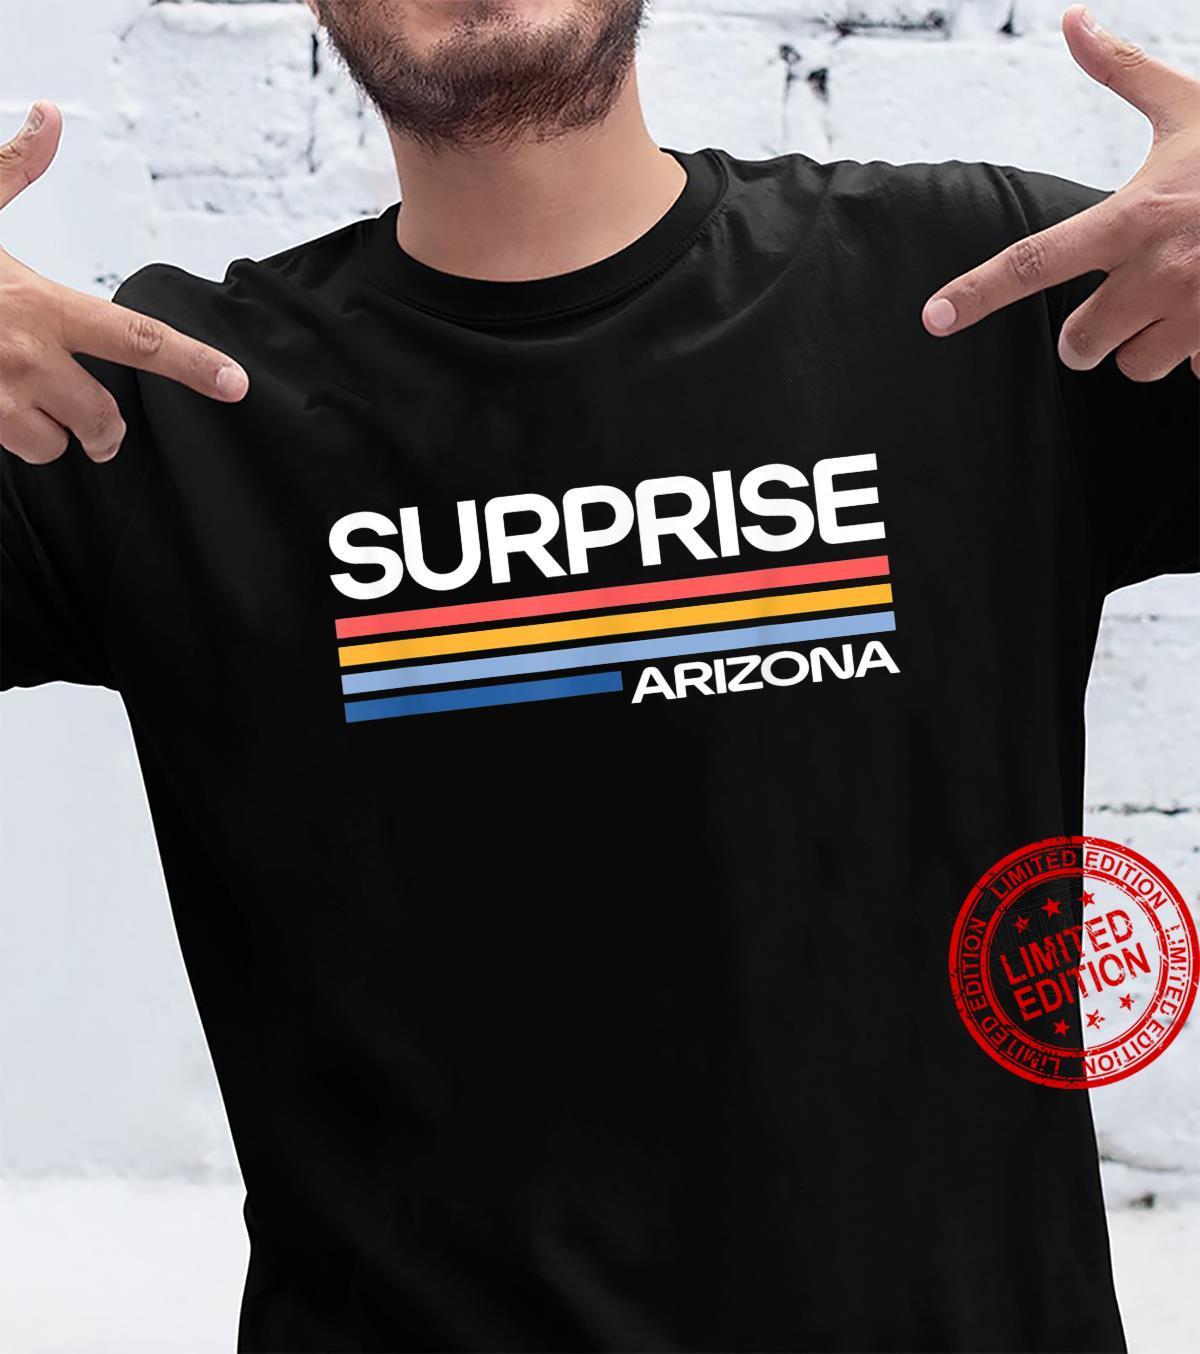 Surprise Arizona AZ Hometown Phoenix Home State American Shirt